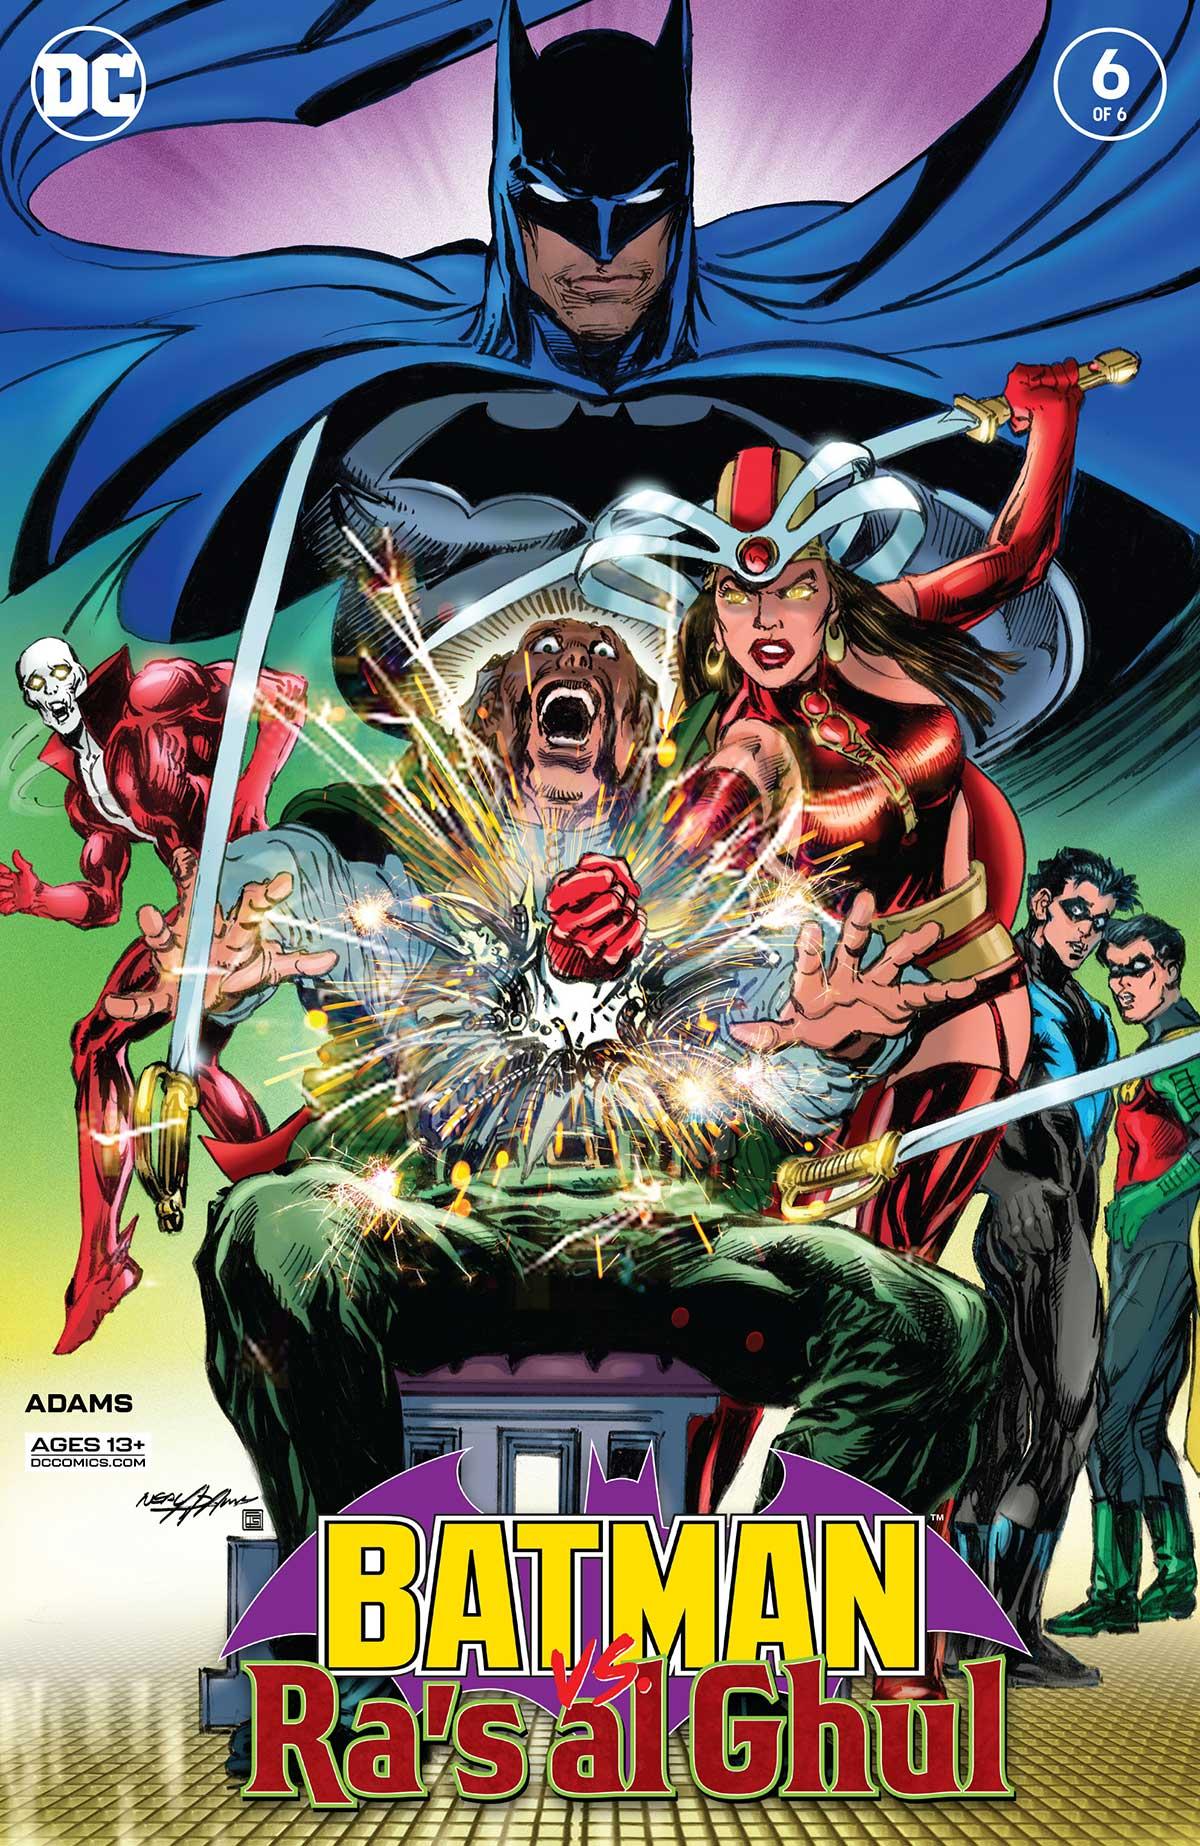 Batman vs. Ra's al Ghul #6